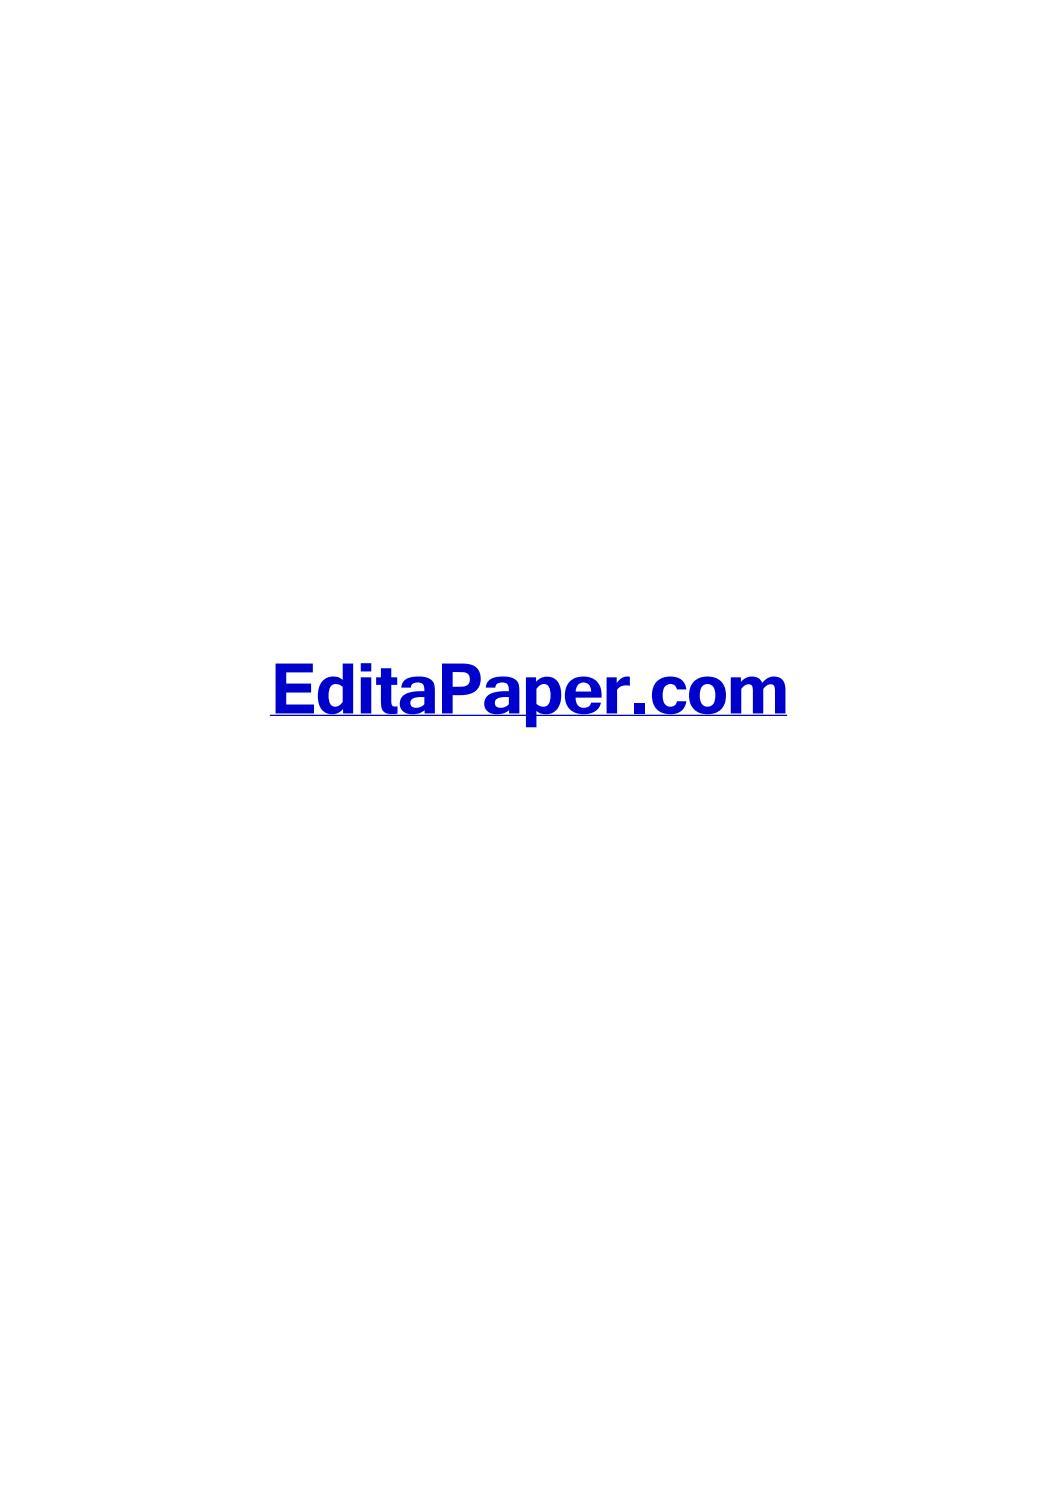 Best speech writers service online